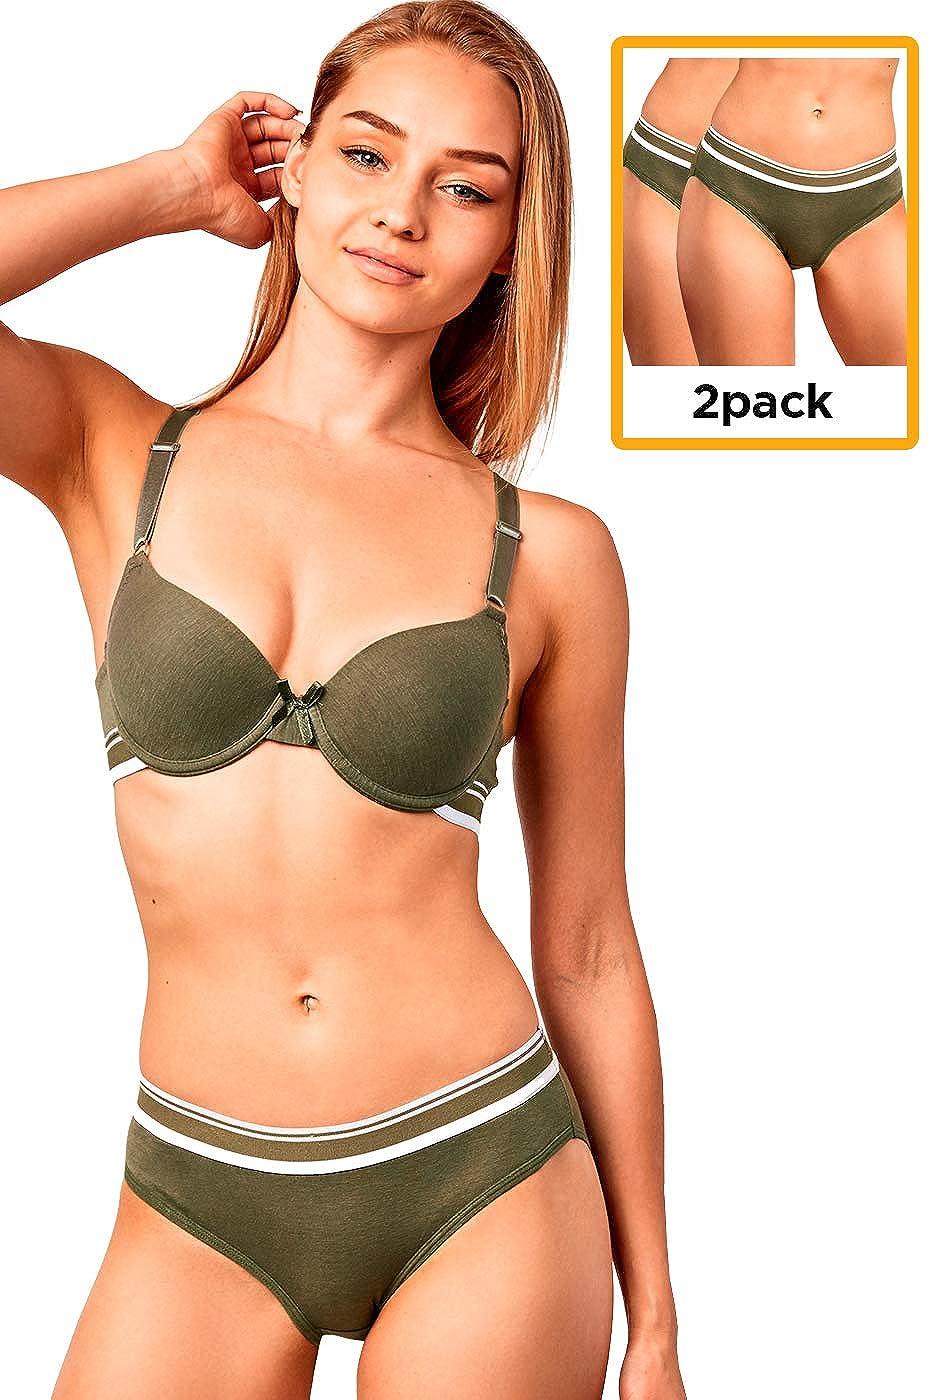 Pack of 6 or 2 Womens Premium Cotton Half Coverage Striped Waistband Bikini Briefs Panty Underwear